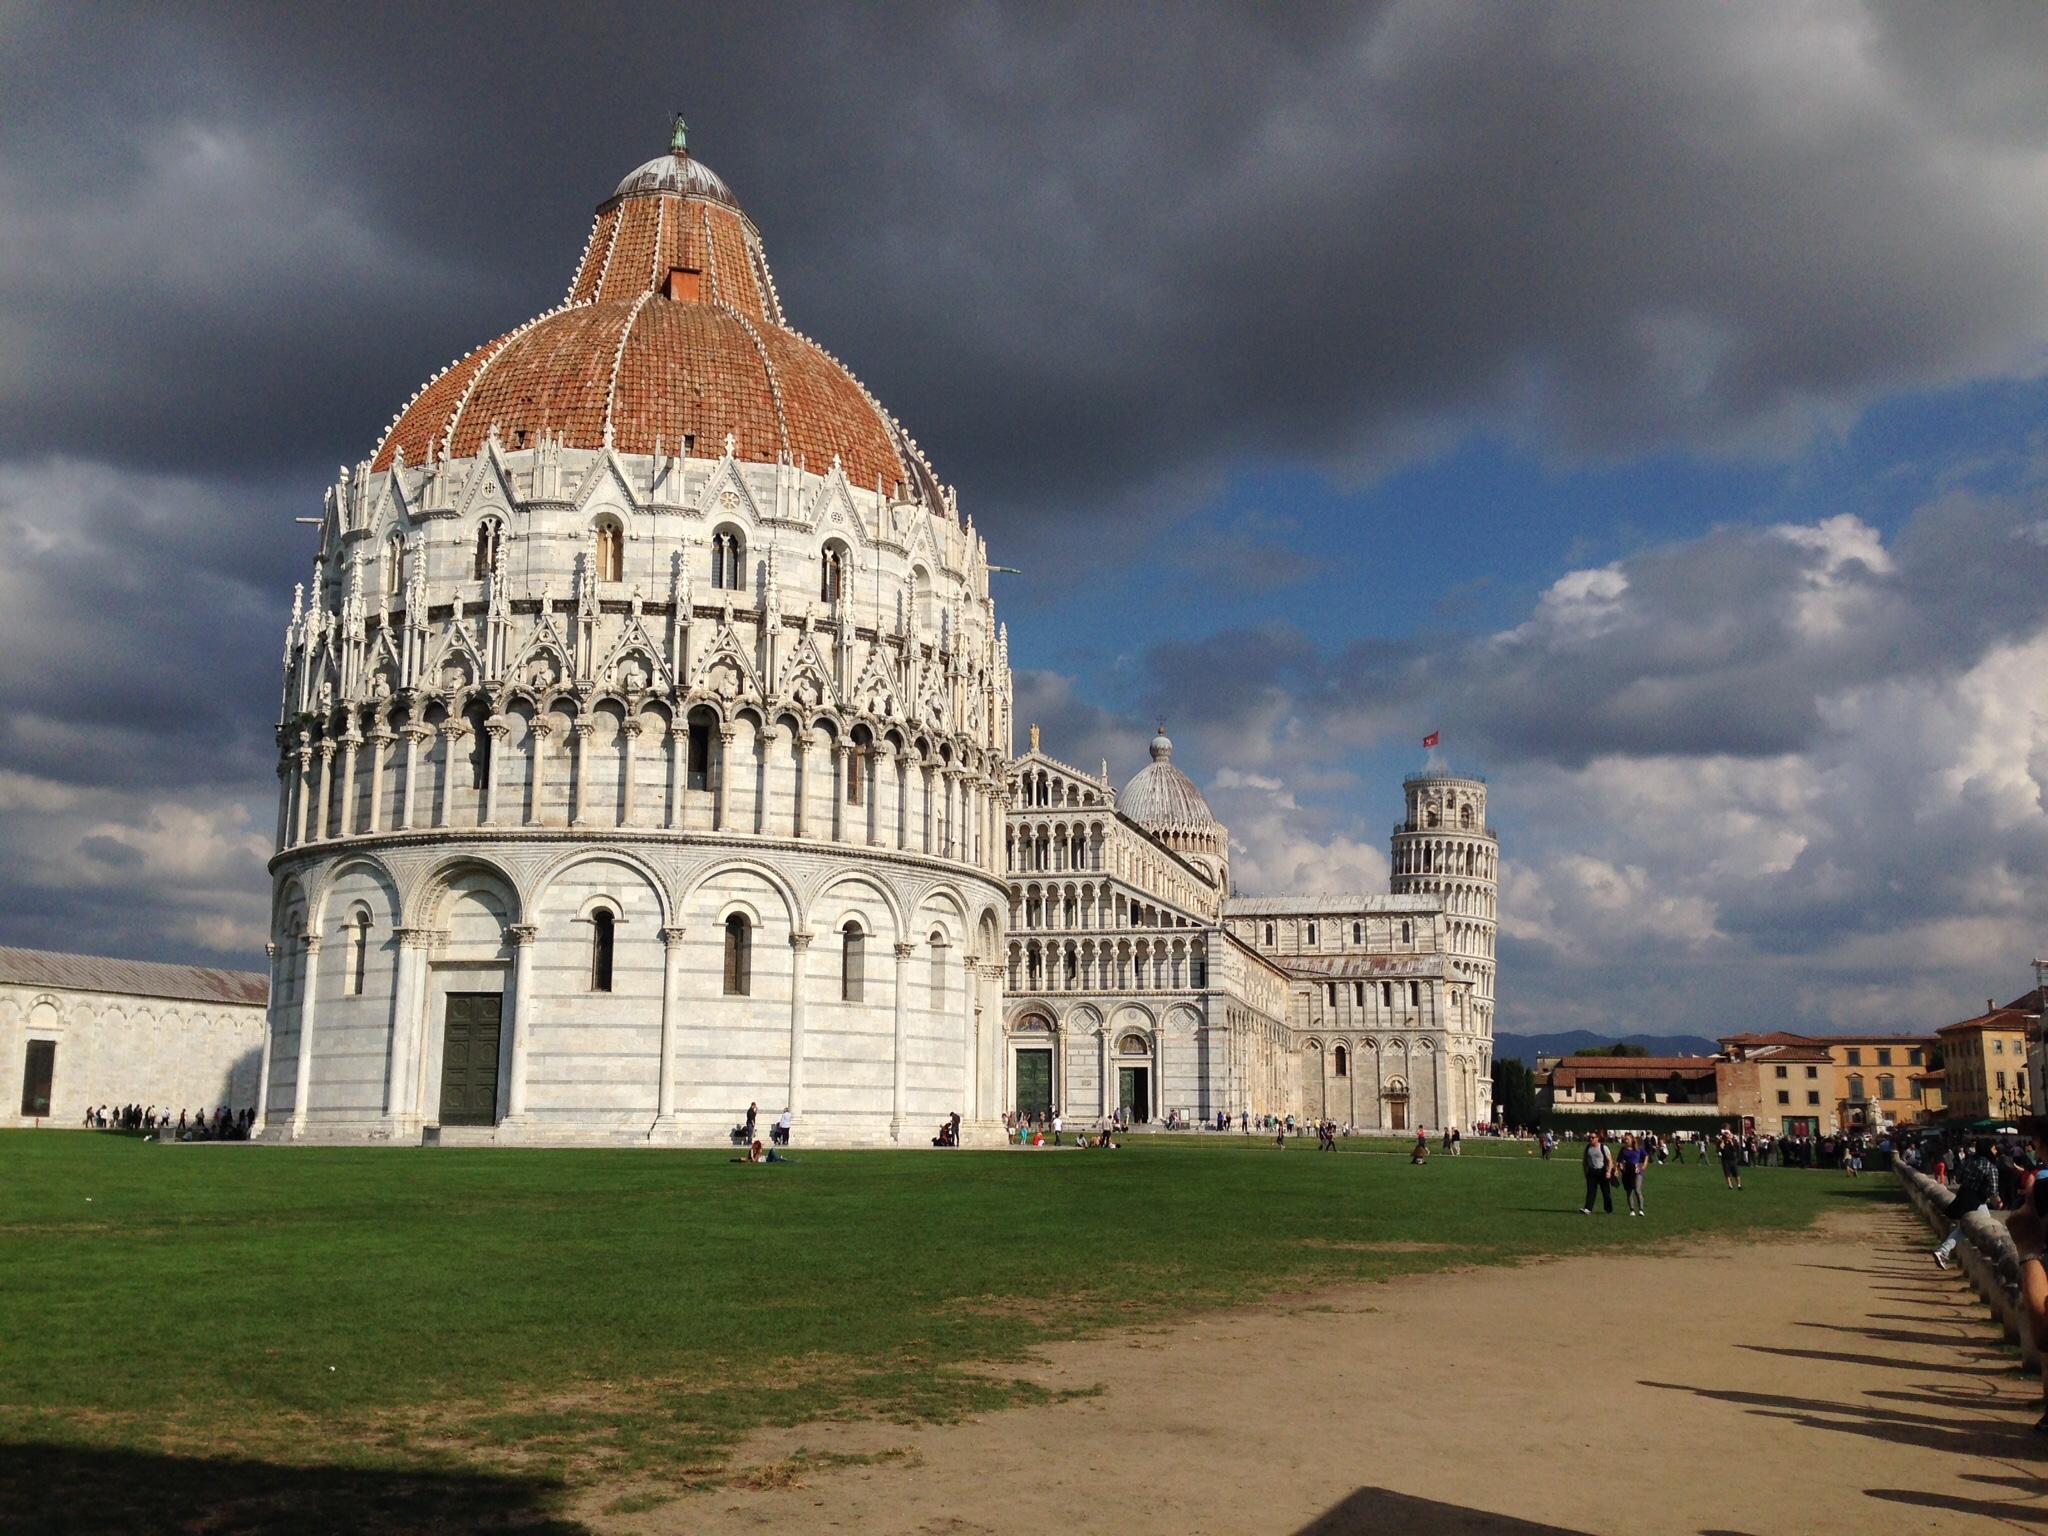 Stormy skies over Pisa